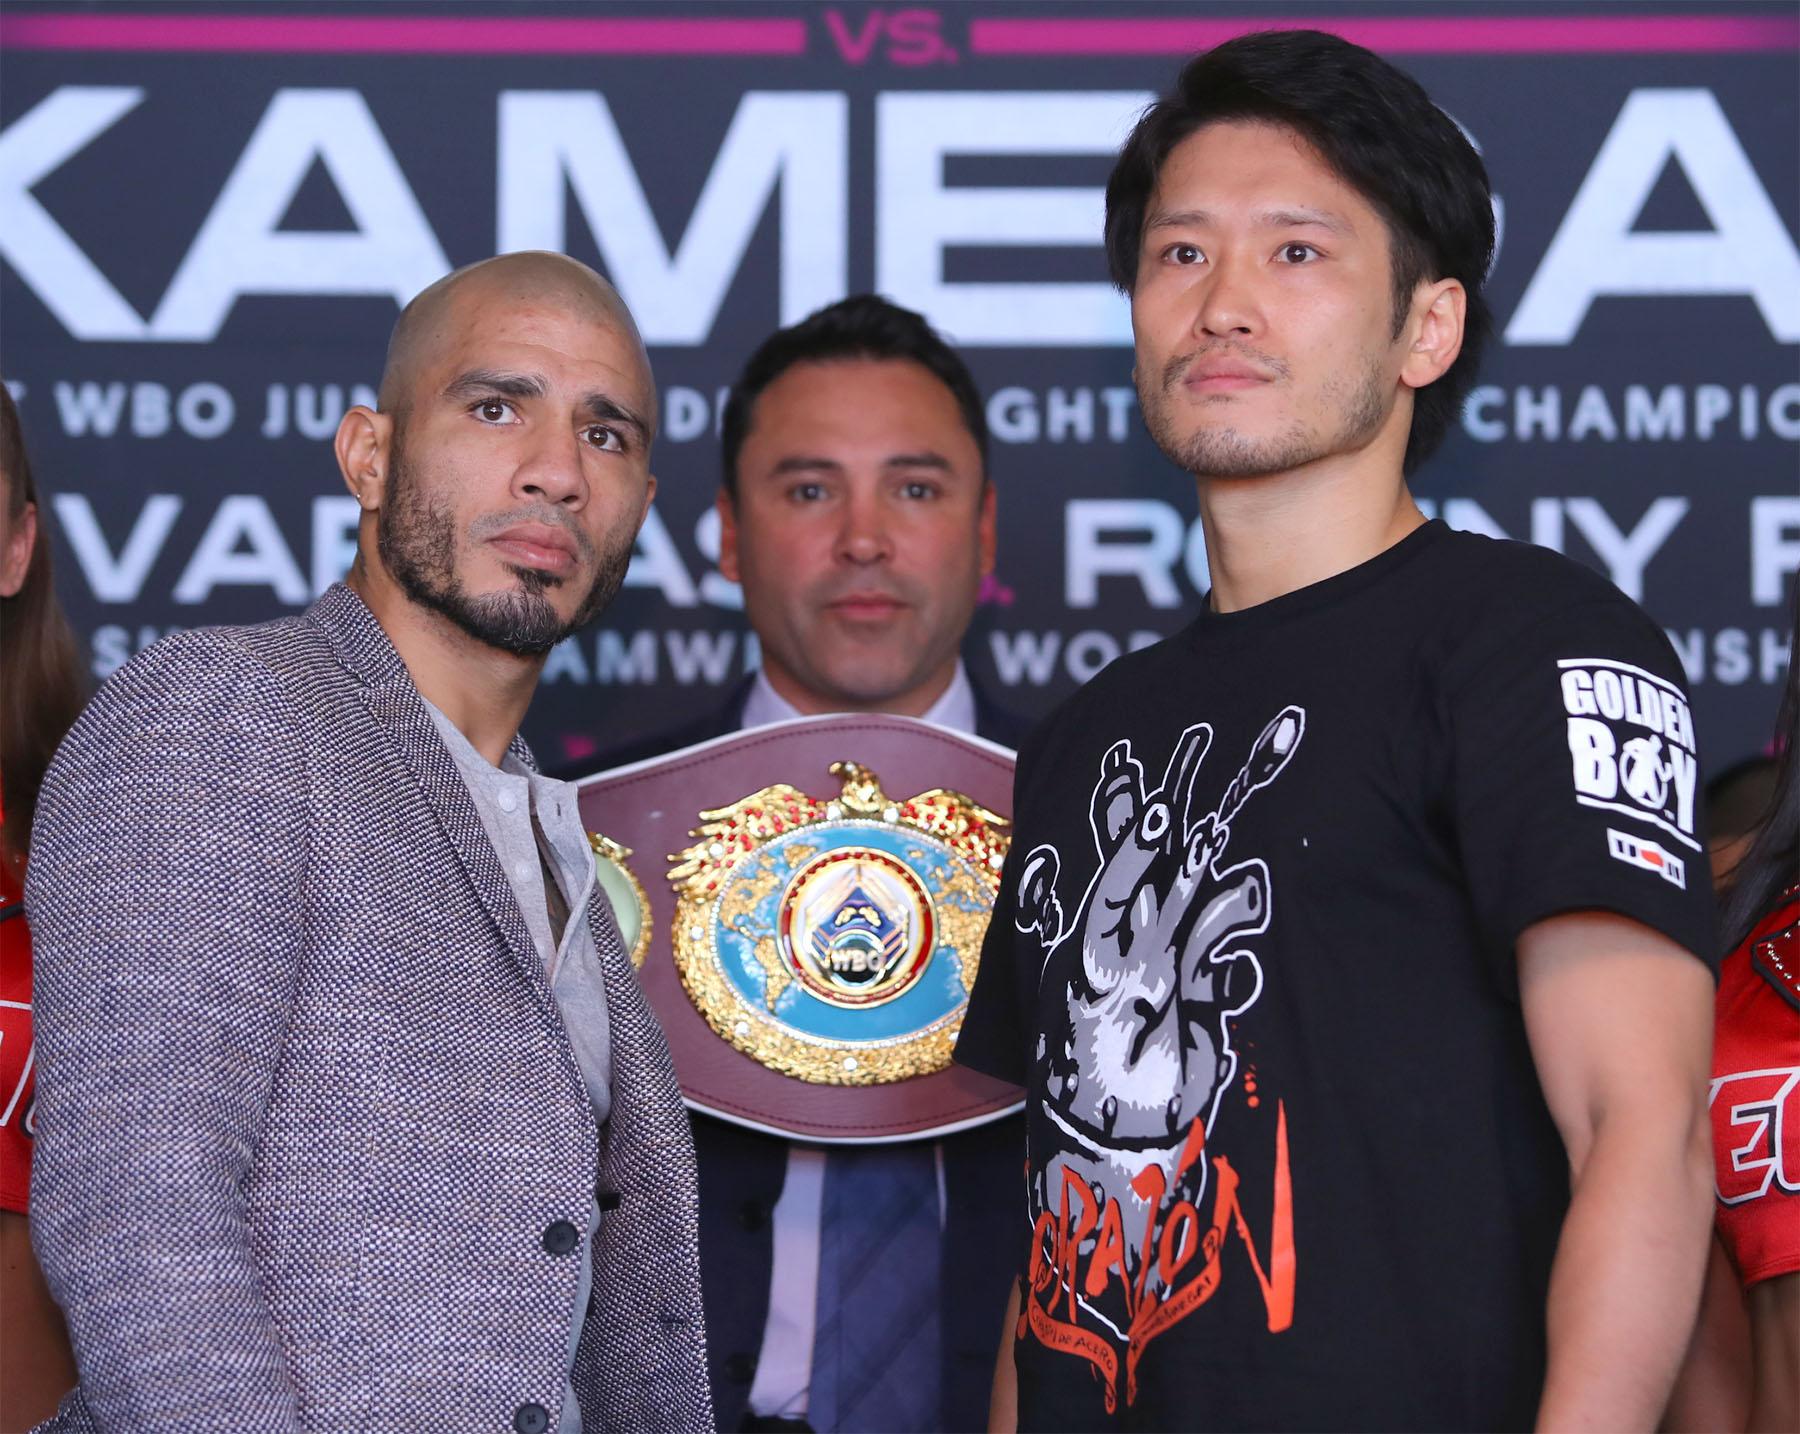 Miguel Cotto, Yoshihiro Kamegai - Ready For War